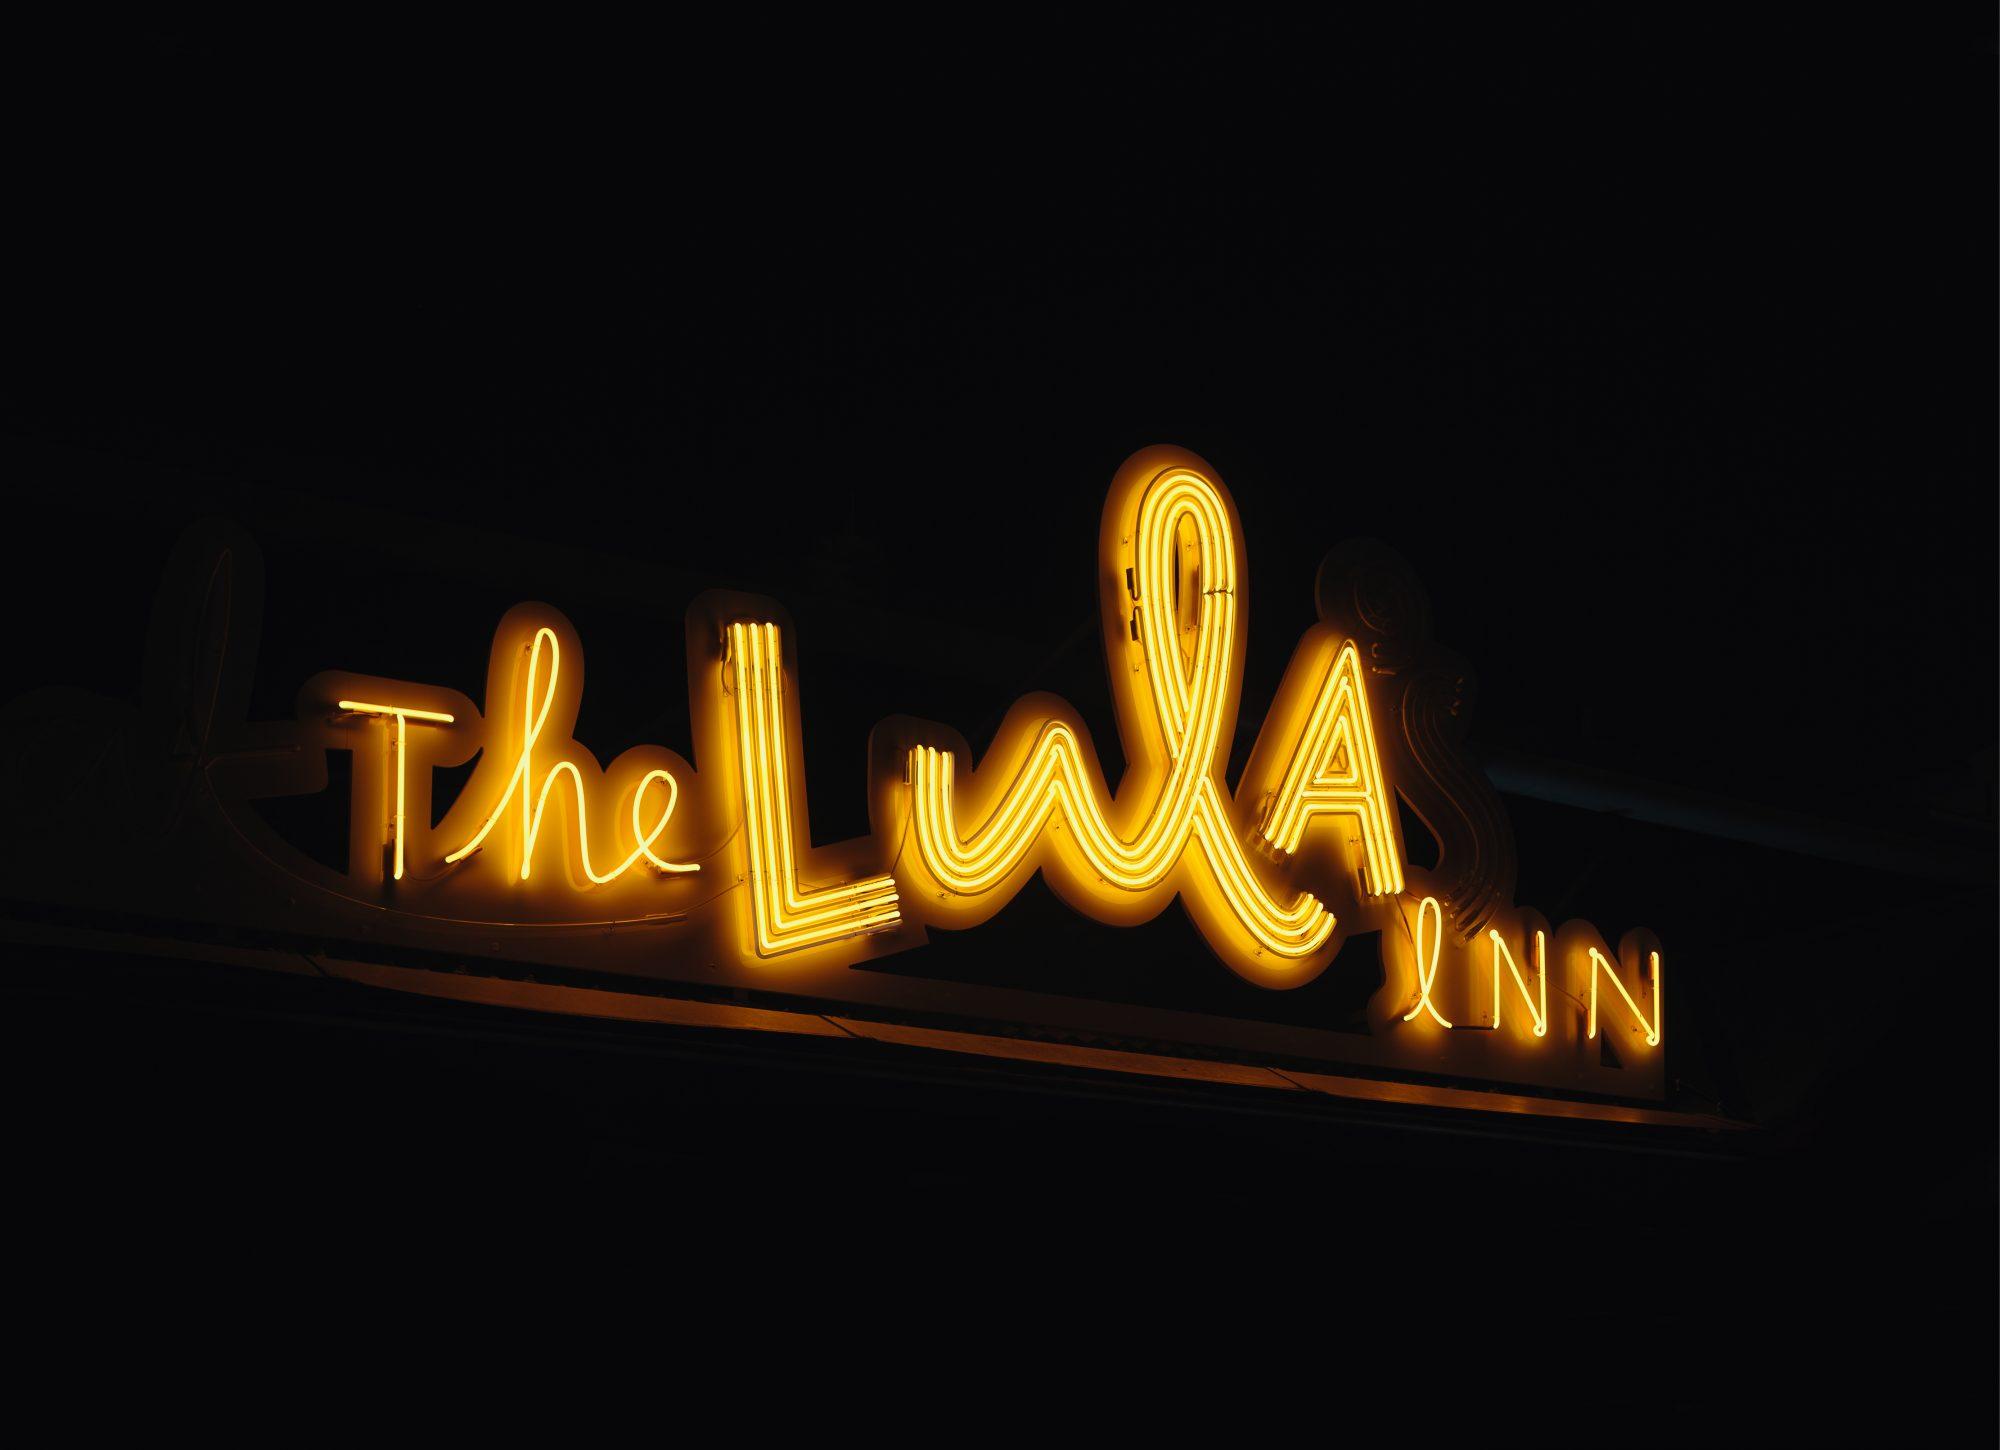 https://tanamitchell.com/wp-content/uploads/2019/01/Lula-Inn-2000x1450px-2000x1450.jpg